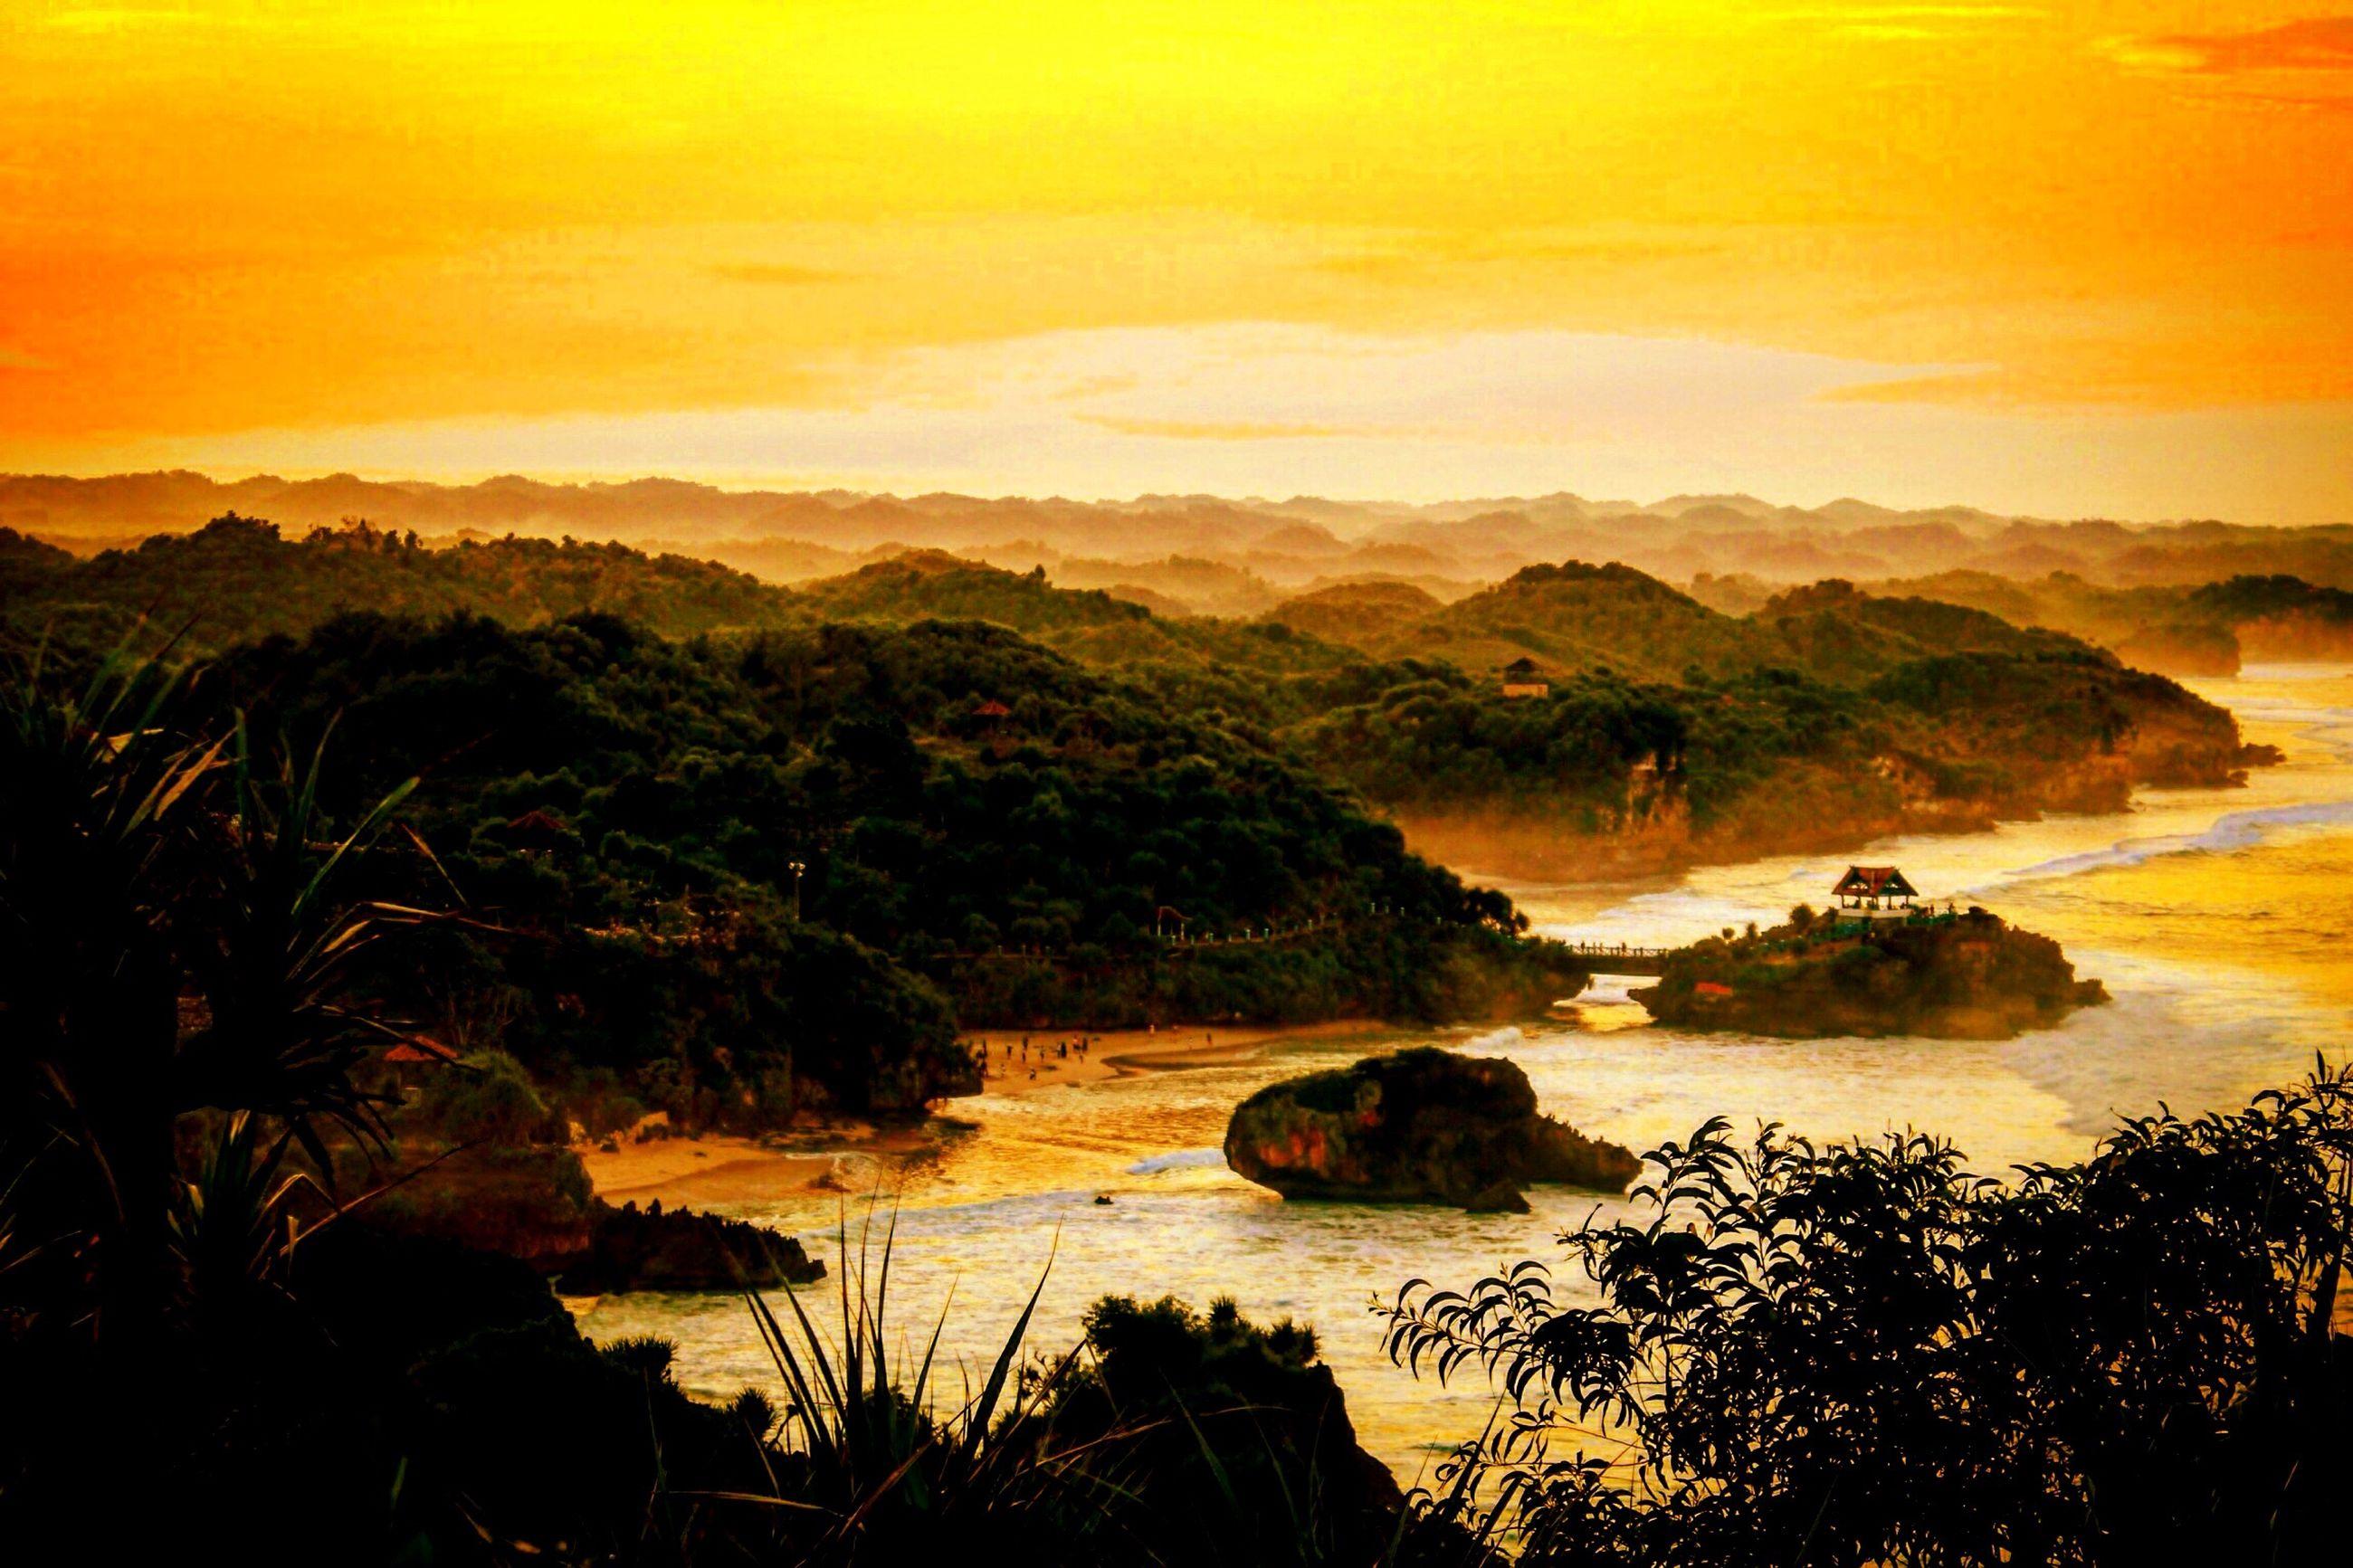 tranquil scene, sunset, scenics, tranquility, beauty in nature, water, nature, sky, sea, rock - object, idyllic, rock formation, landscape, orange color, non-urban scene, silhouette, cliff, rock, mountain, remote